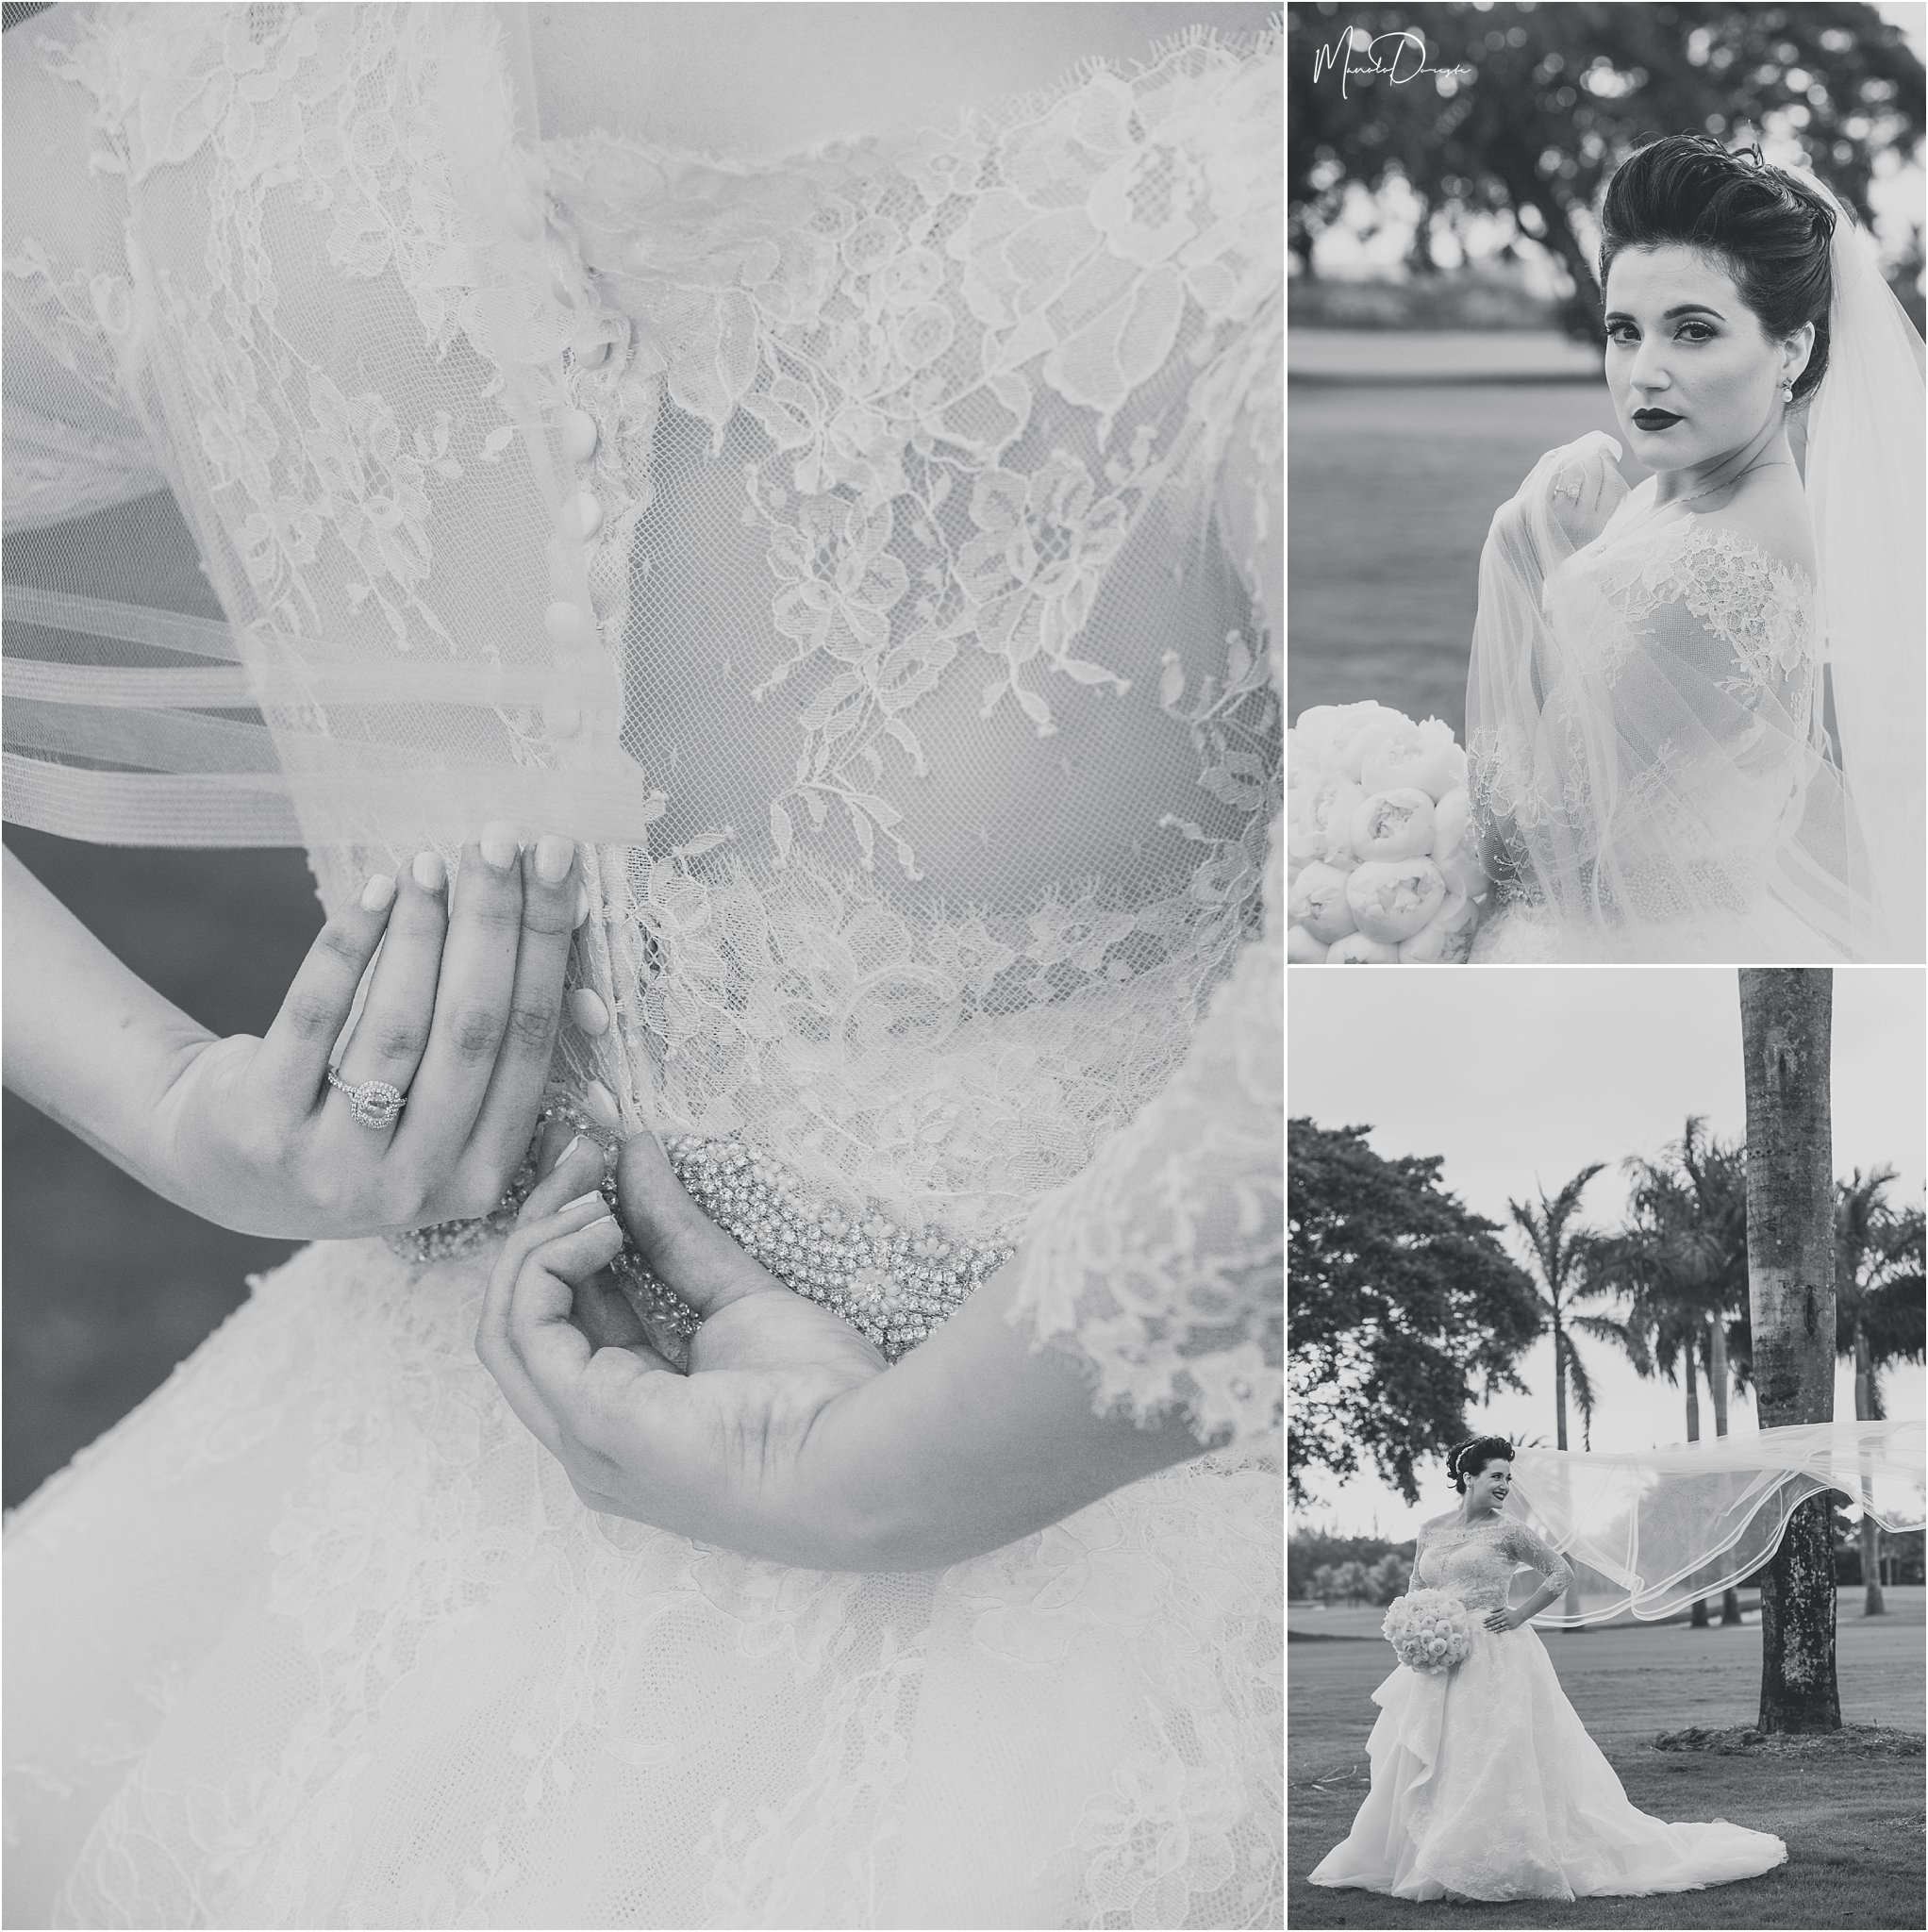 00956_ManoloDoreste_InFocusStudios_Wedding_Family_Photography_Miami_MiamiPhotographer.jpg